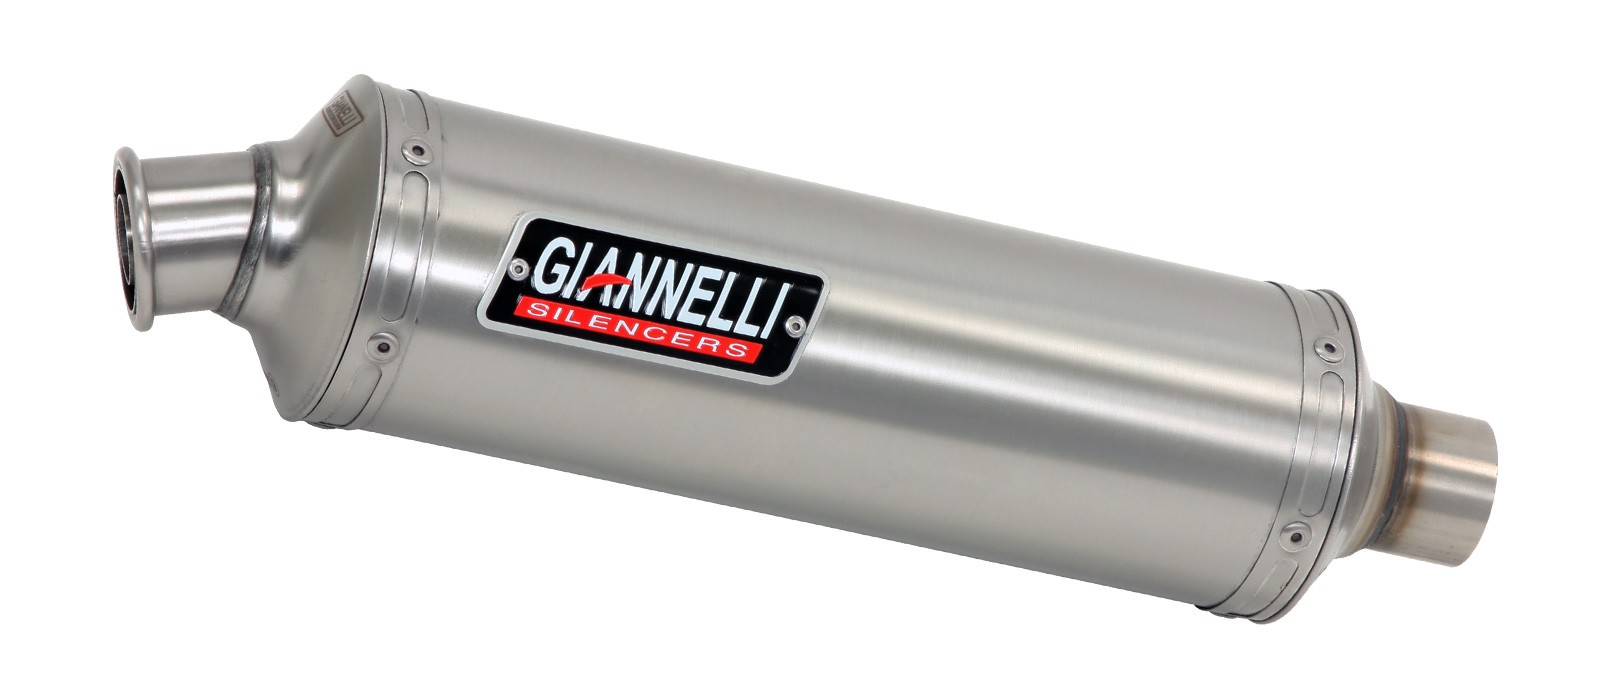 ESCAPES GIANNELLI UNIVERSALES - ROUND Sistema completo Silenciador carbono (colectores racing) Honda CBR 125 R Giannelli